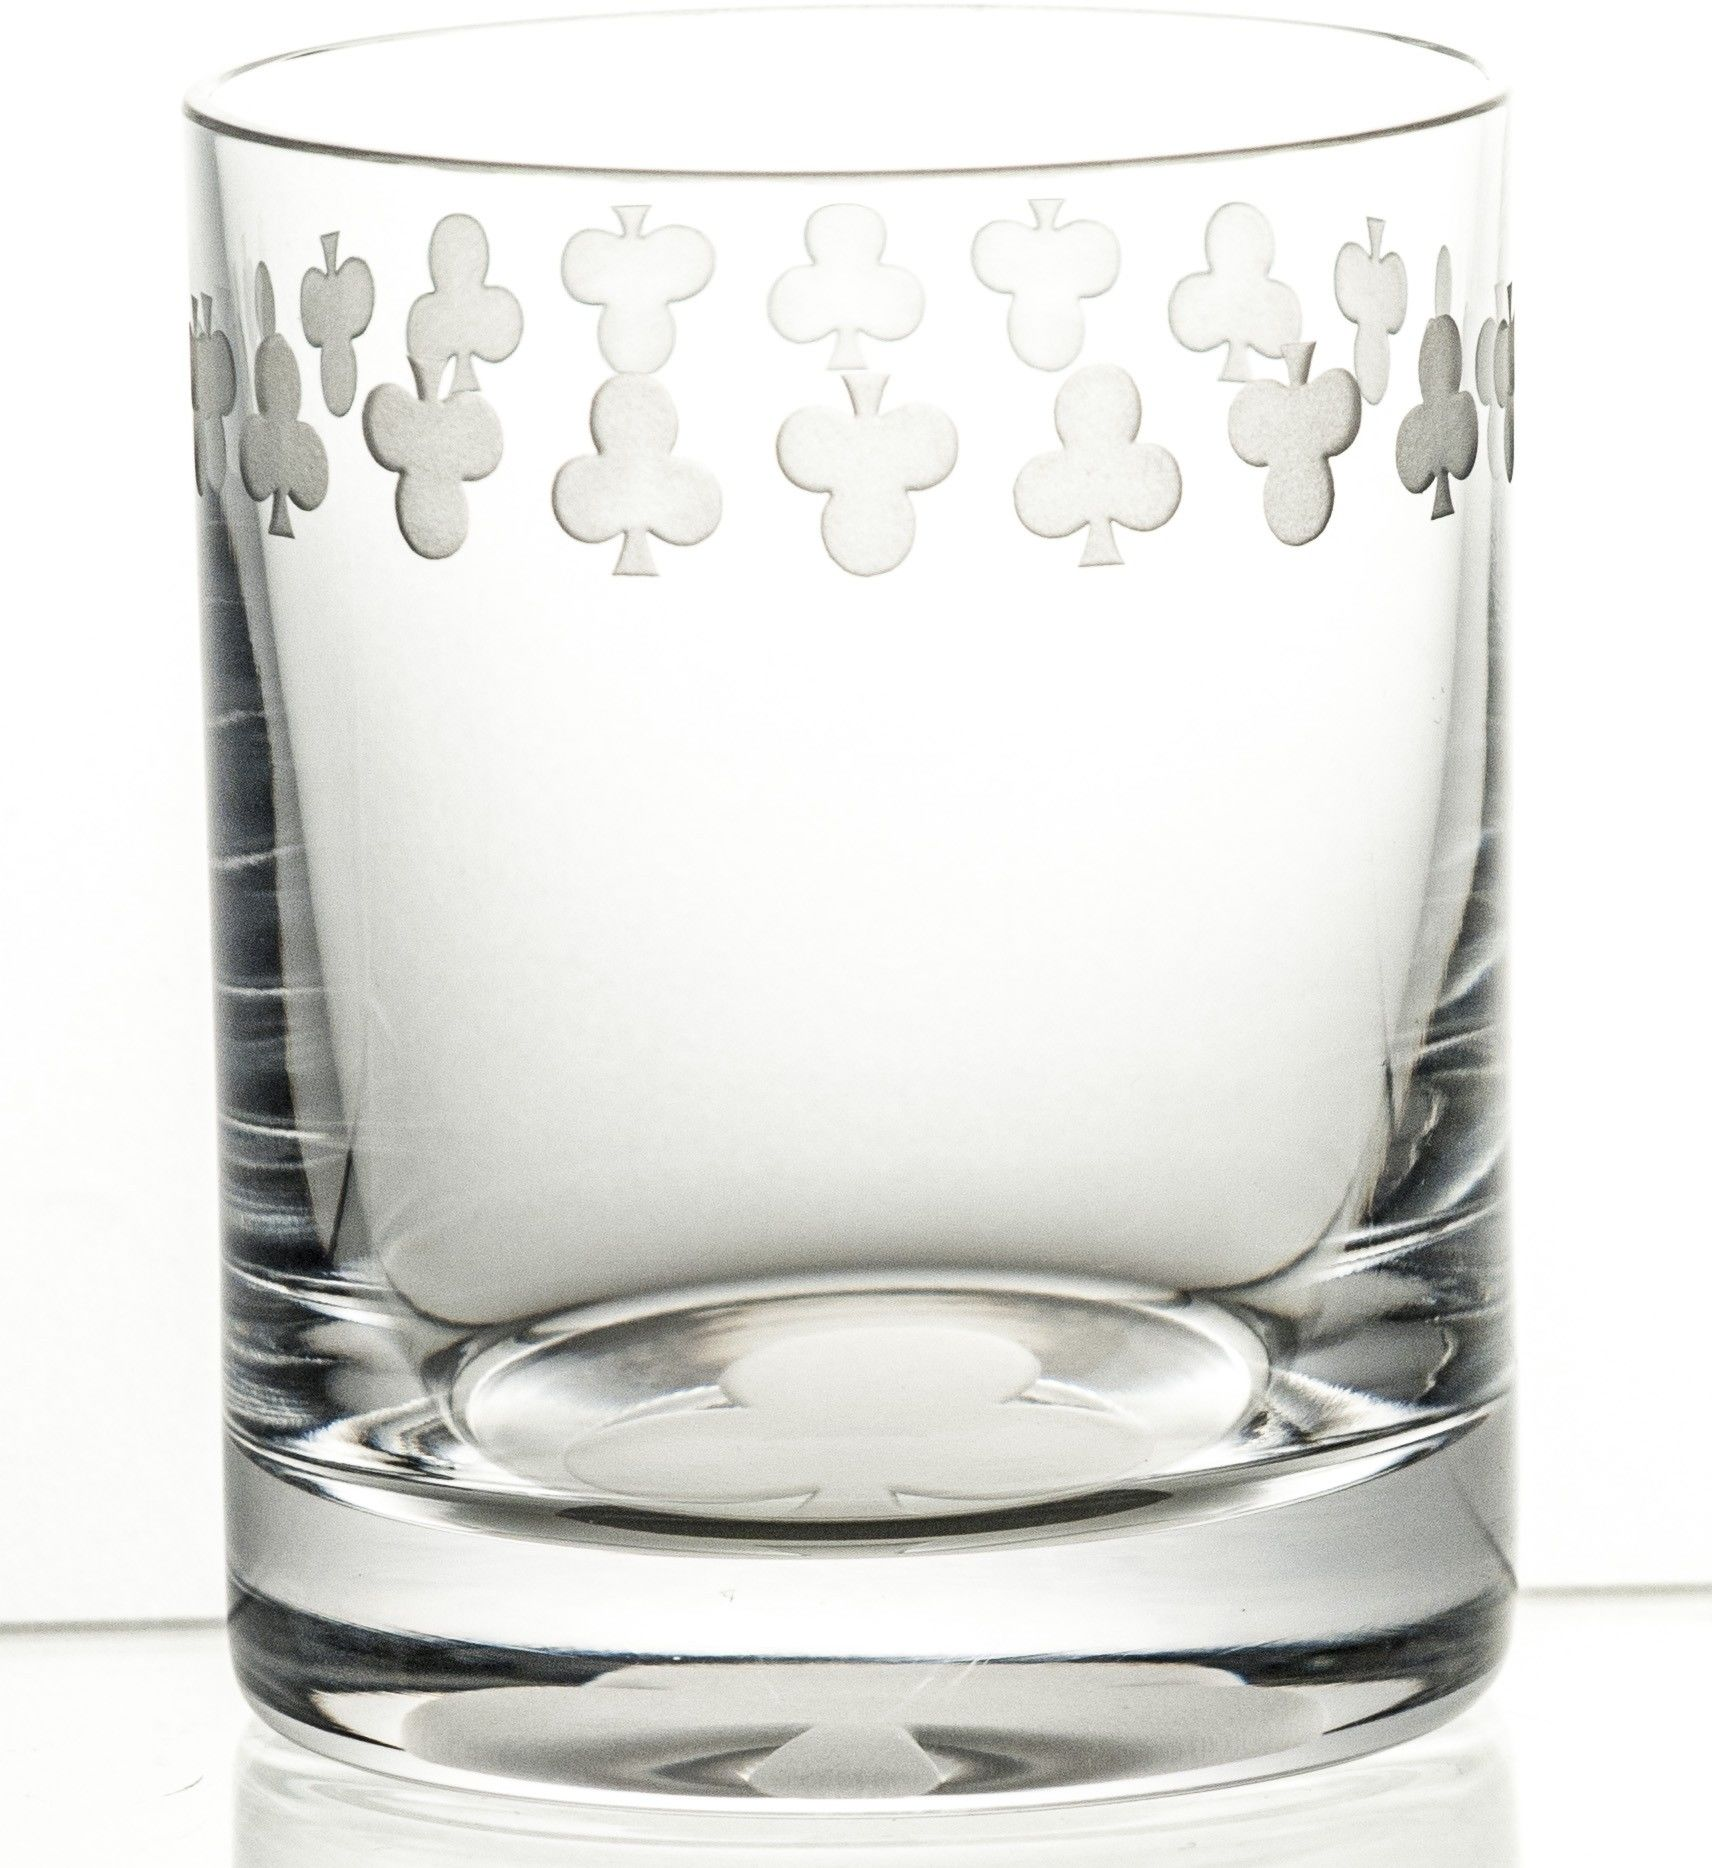 Karta do gry trefl szklanka do whisky grawer (05933)